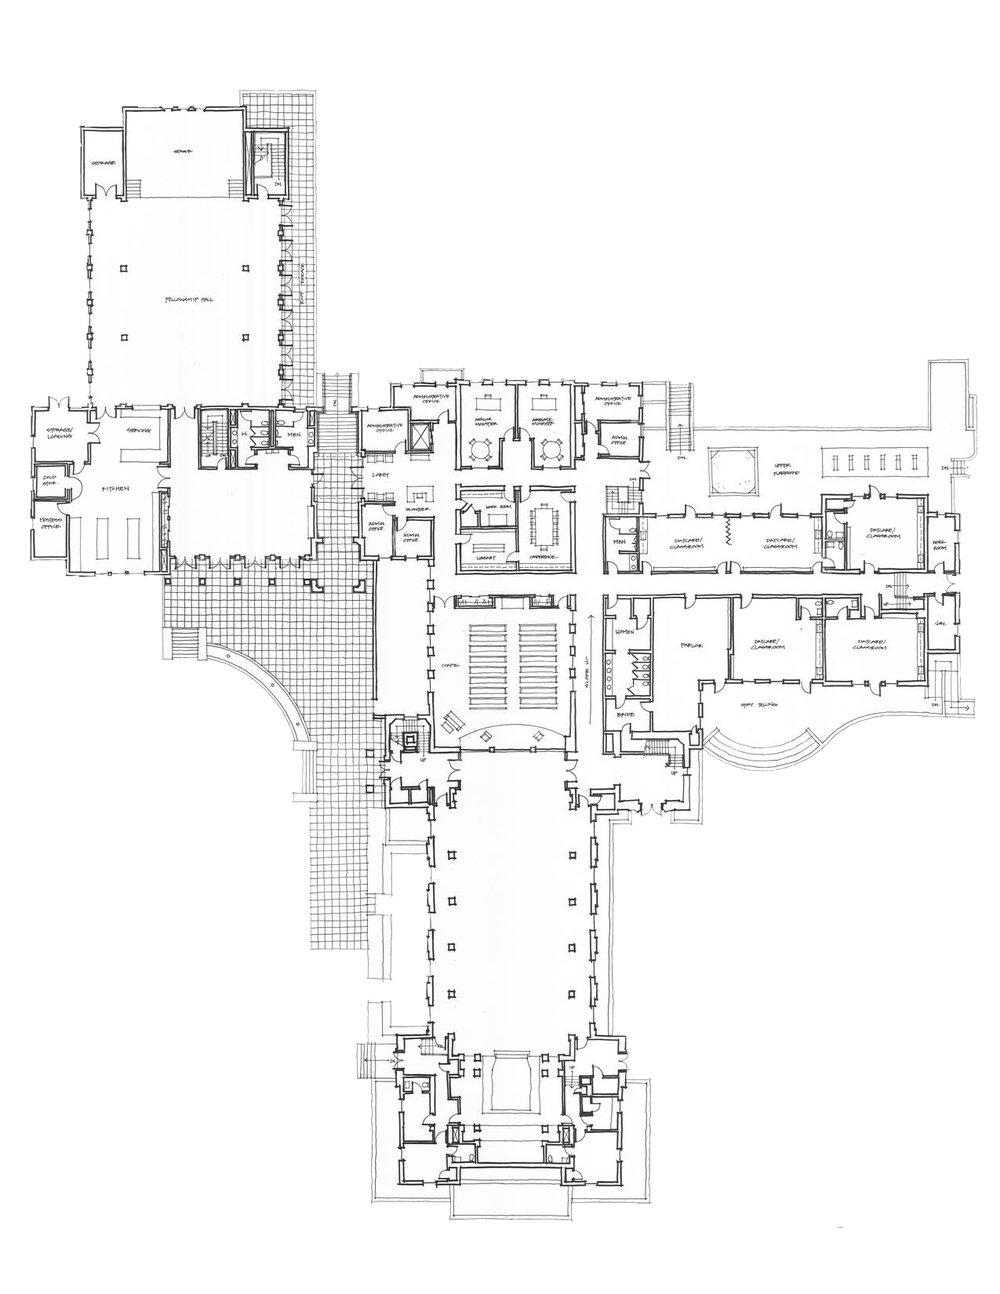 fumc-fmk-architects